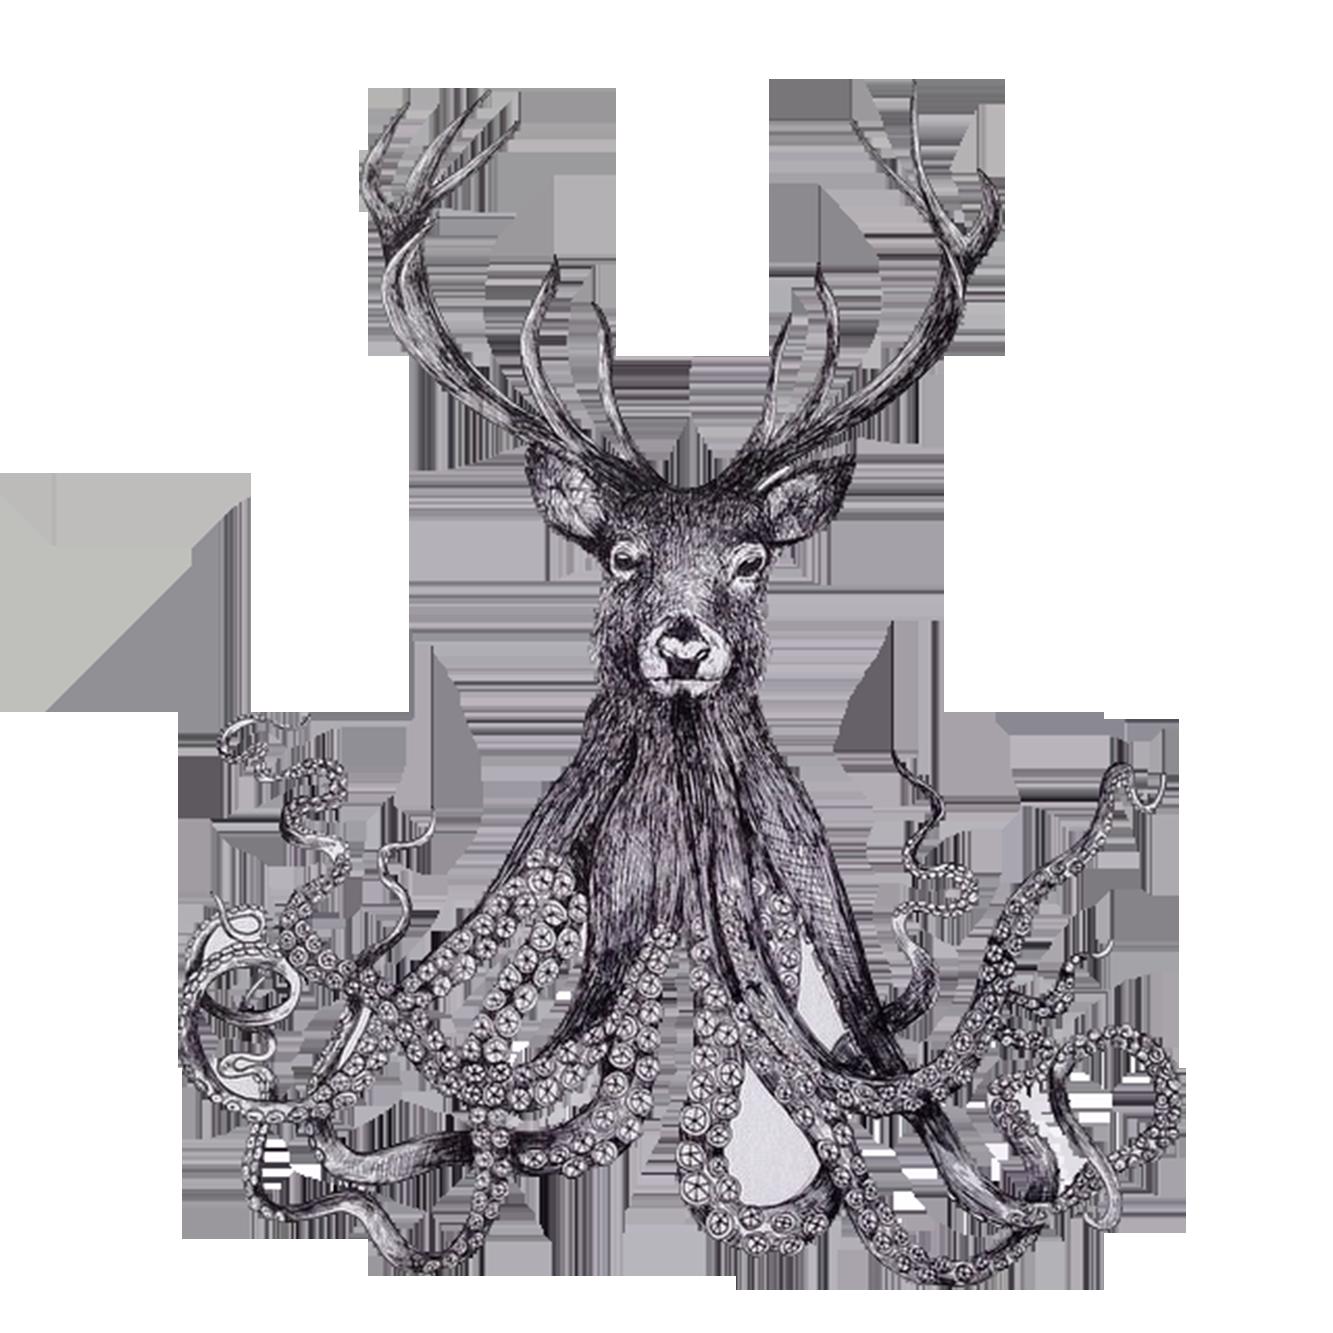 clip freeuse library Paper illustrator illustration hand. Drawing octopus pen